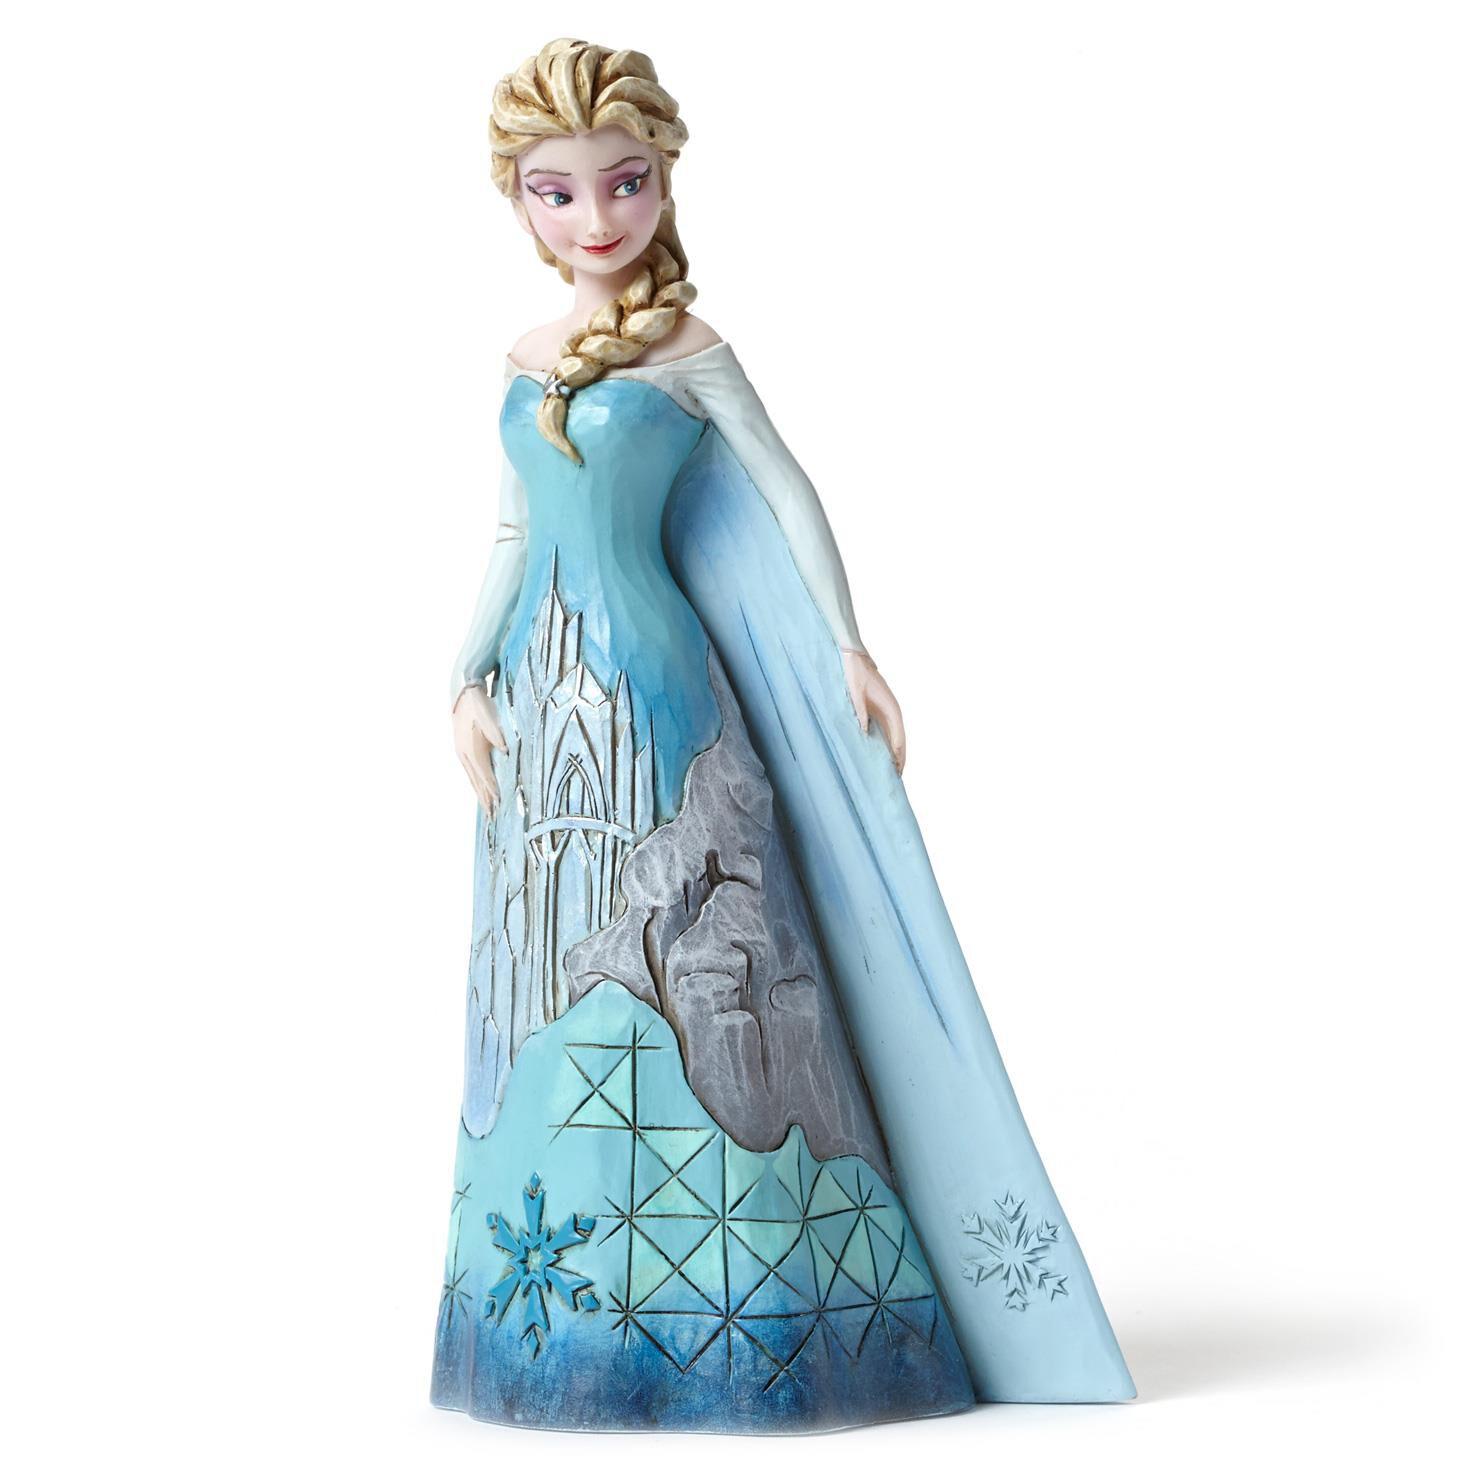 Disney frozen ornaments - Disney Frozen Ornaments 42